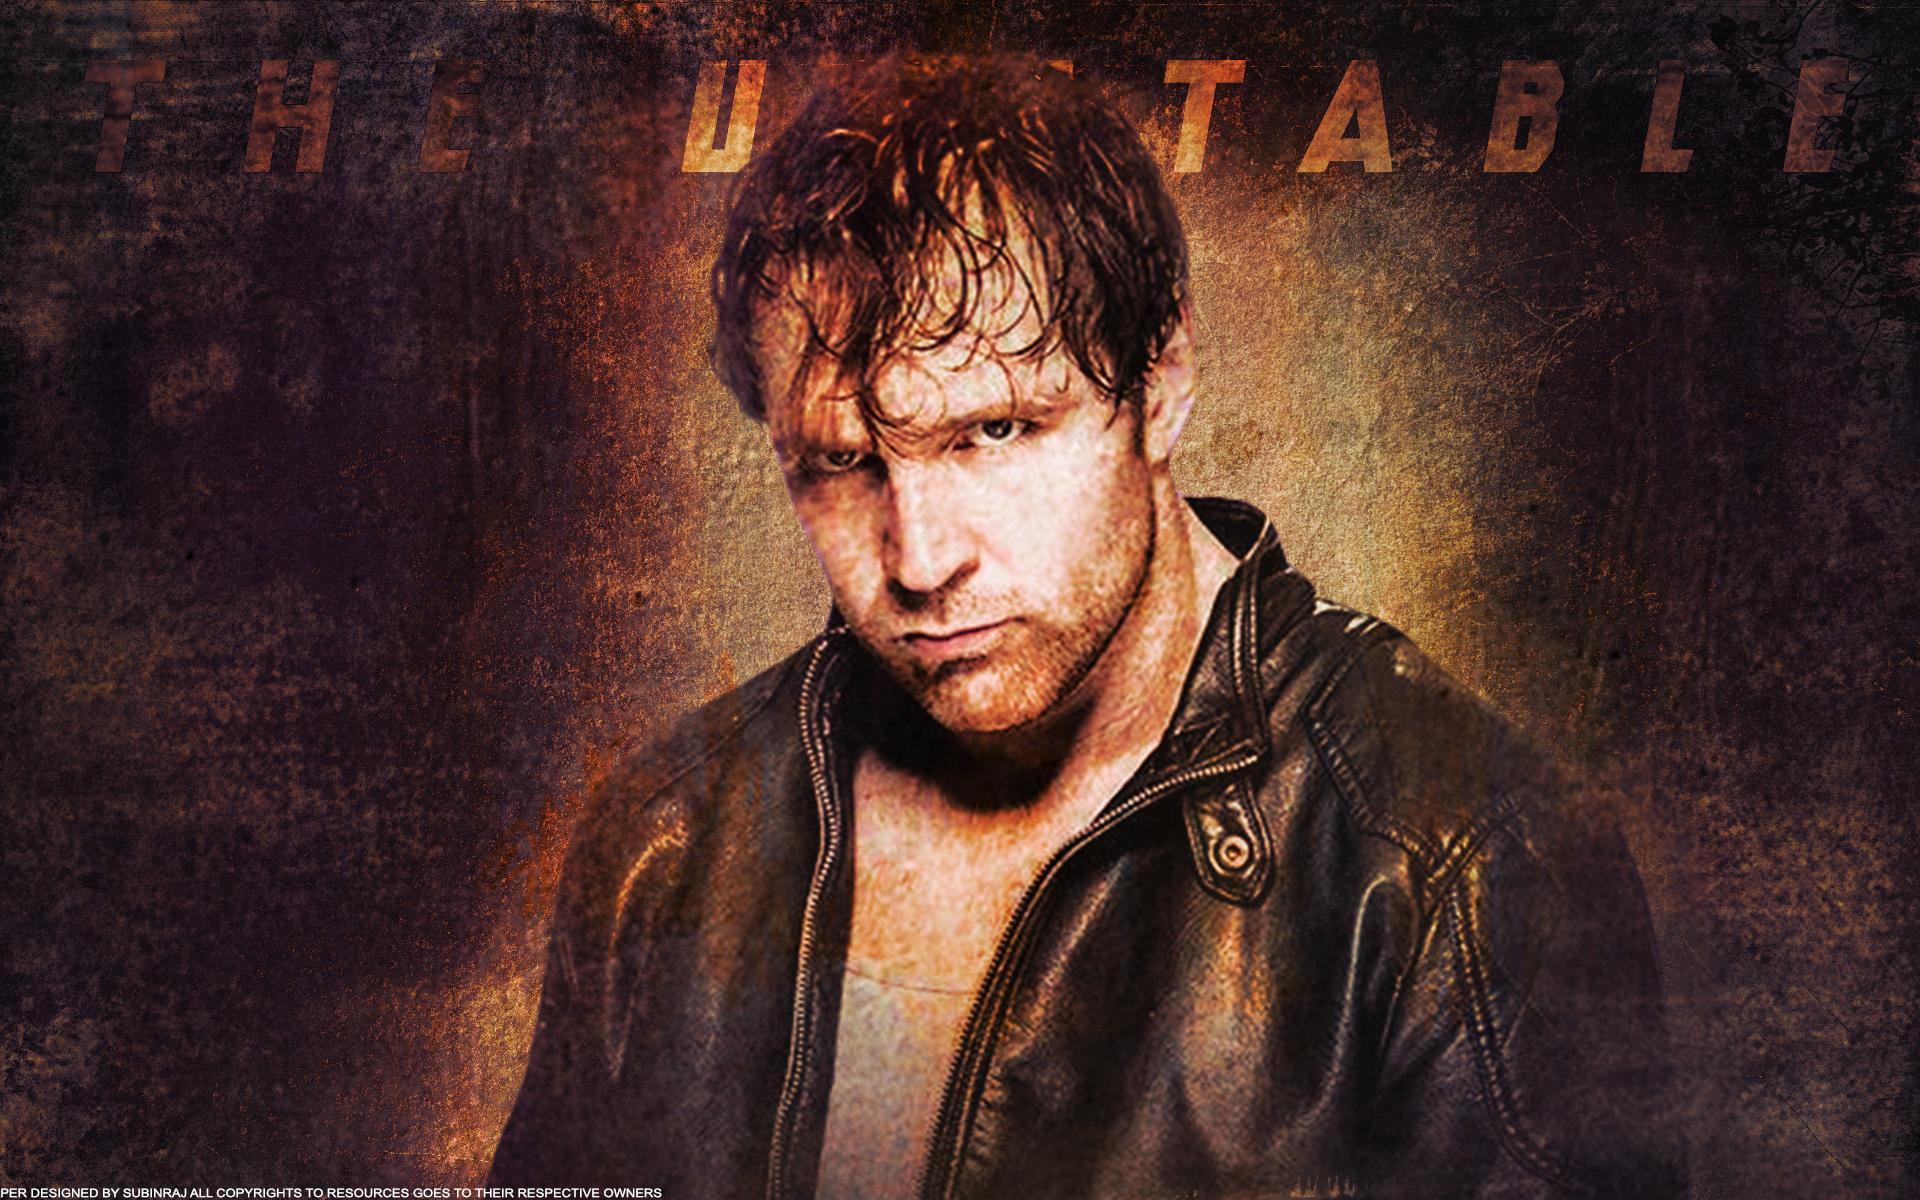 The Unstable Dean Ambrose Full HD Wallpaper by Subinraj 1920x1200